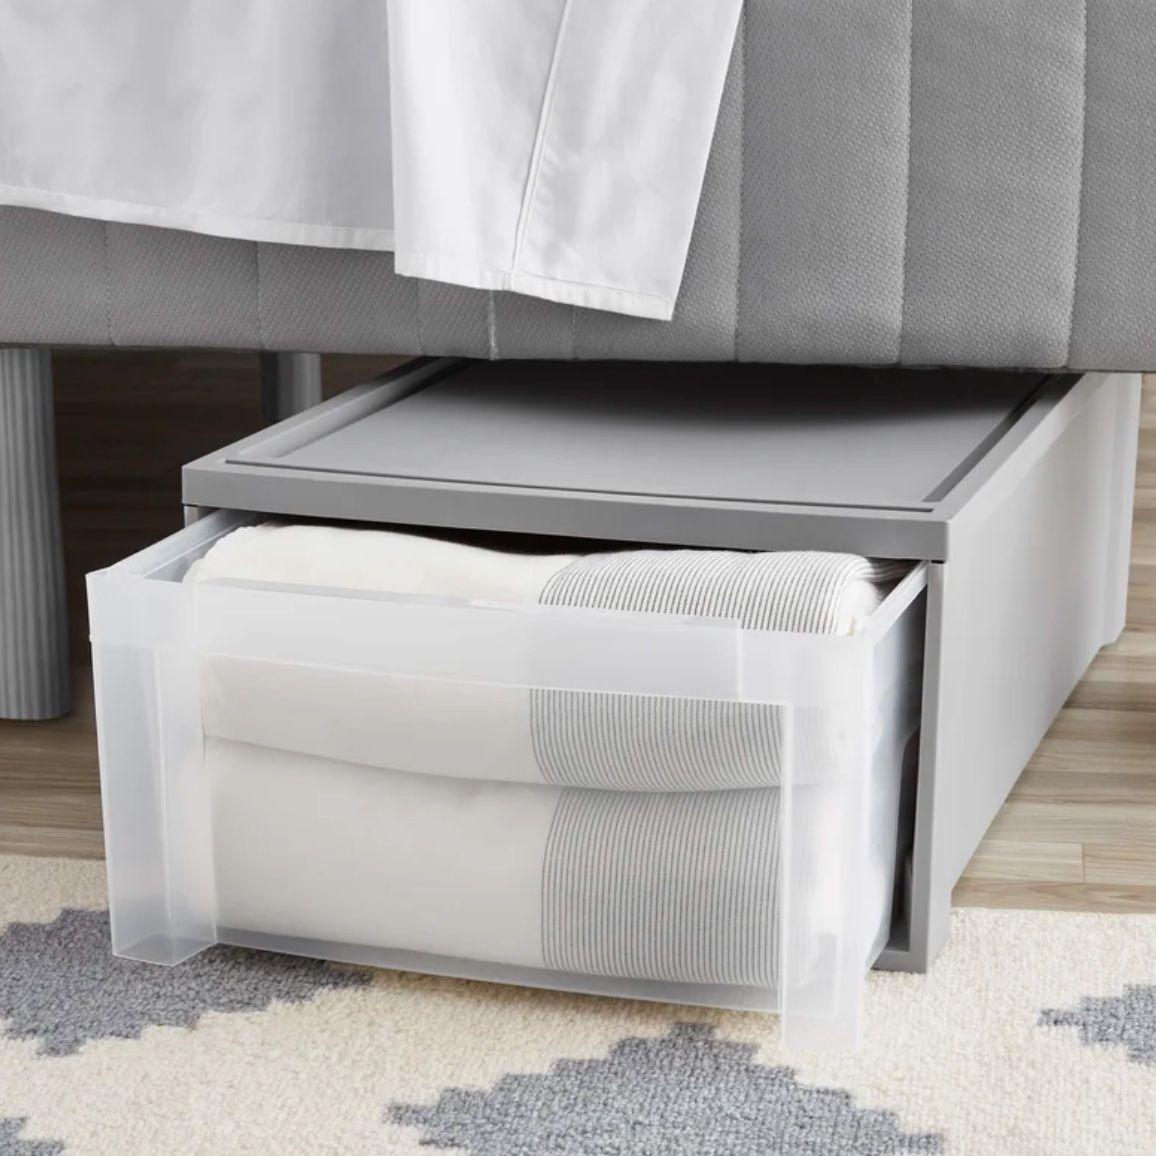 "Shanda Under Bed 17.3"" Stackable Storage Drawer"